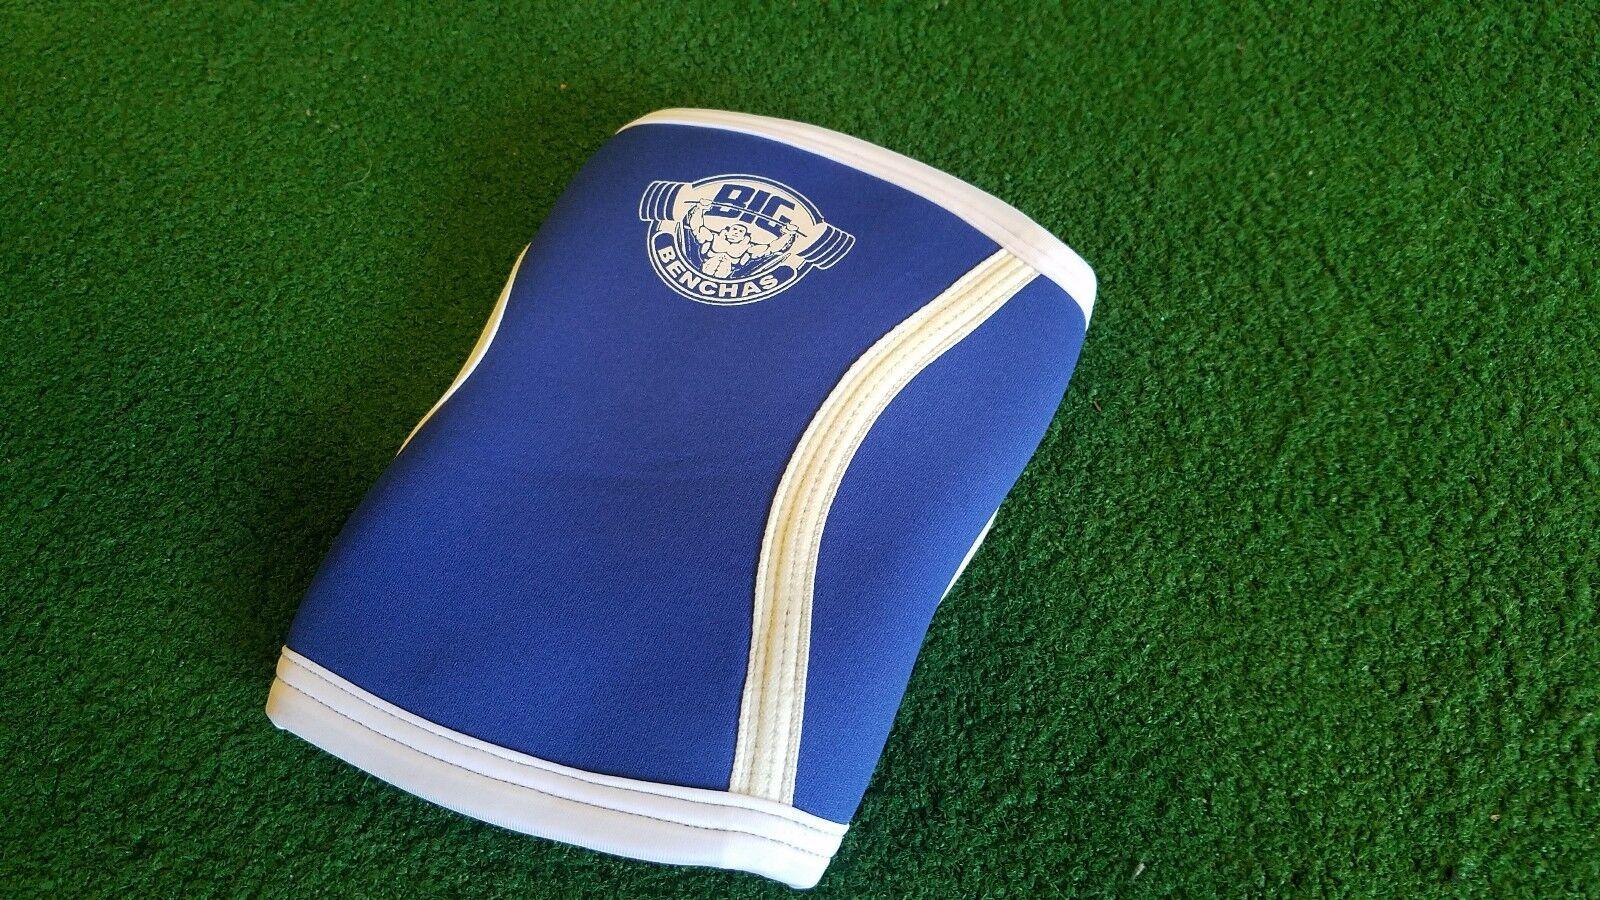 Big Benchas bluee Powerlifting Elbow Sleeves S - 3XL